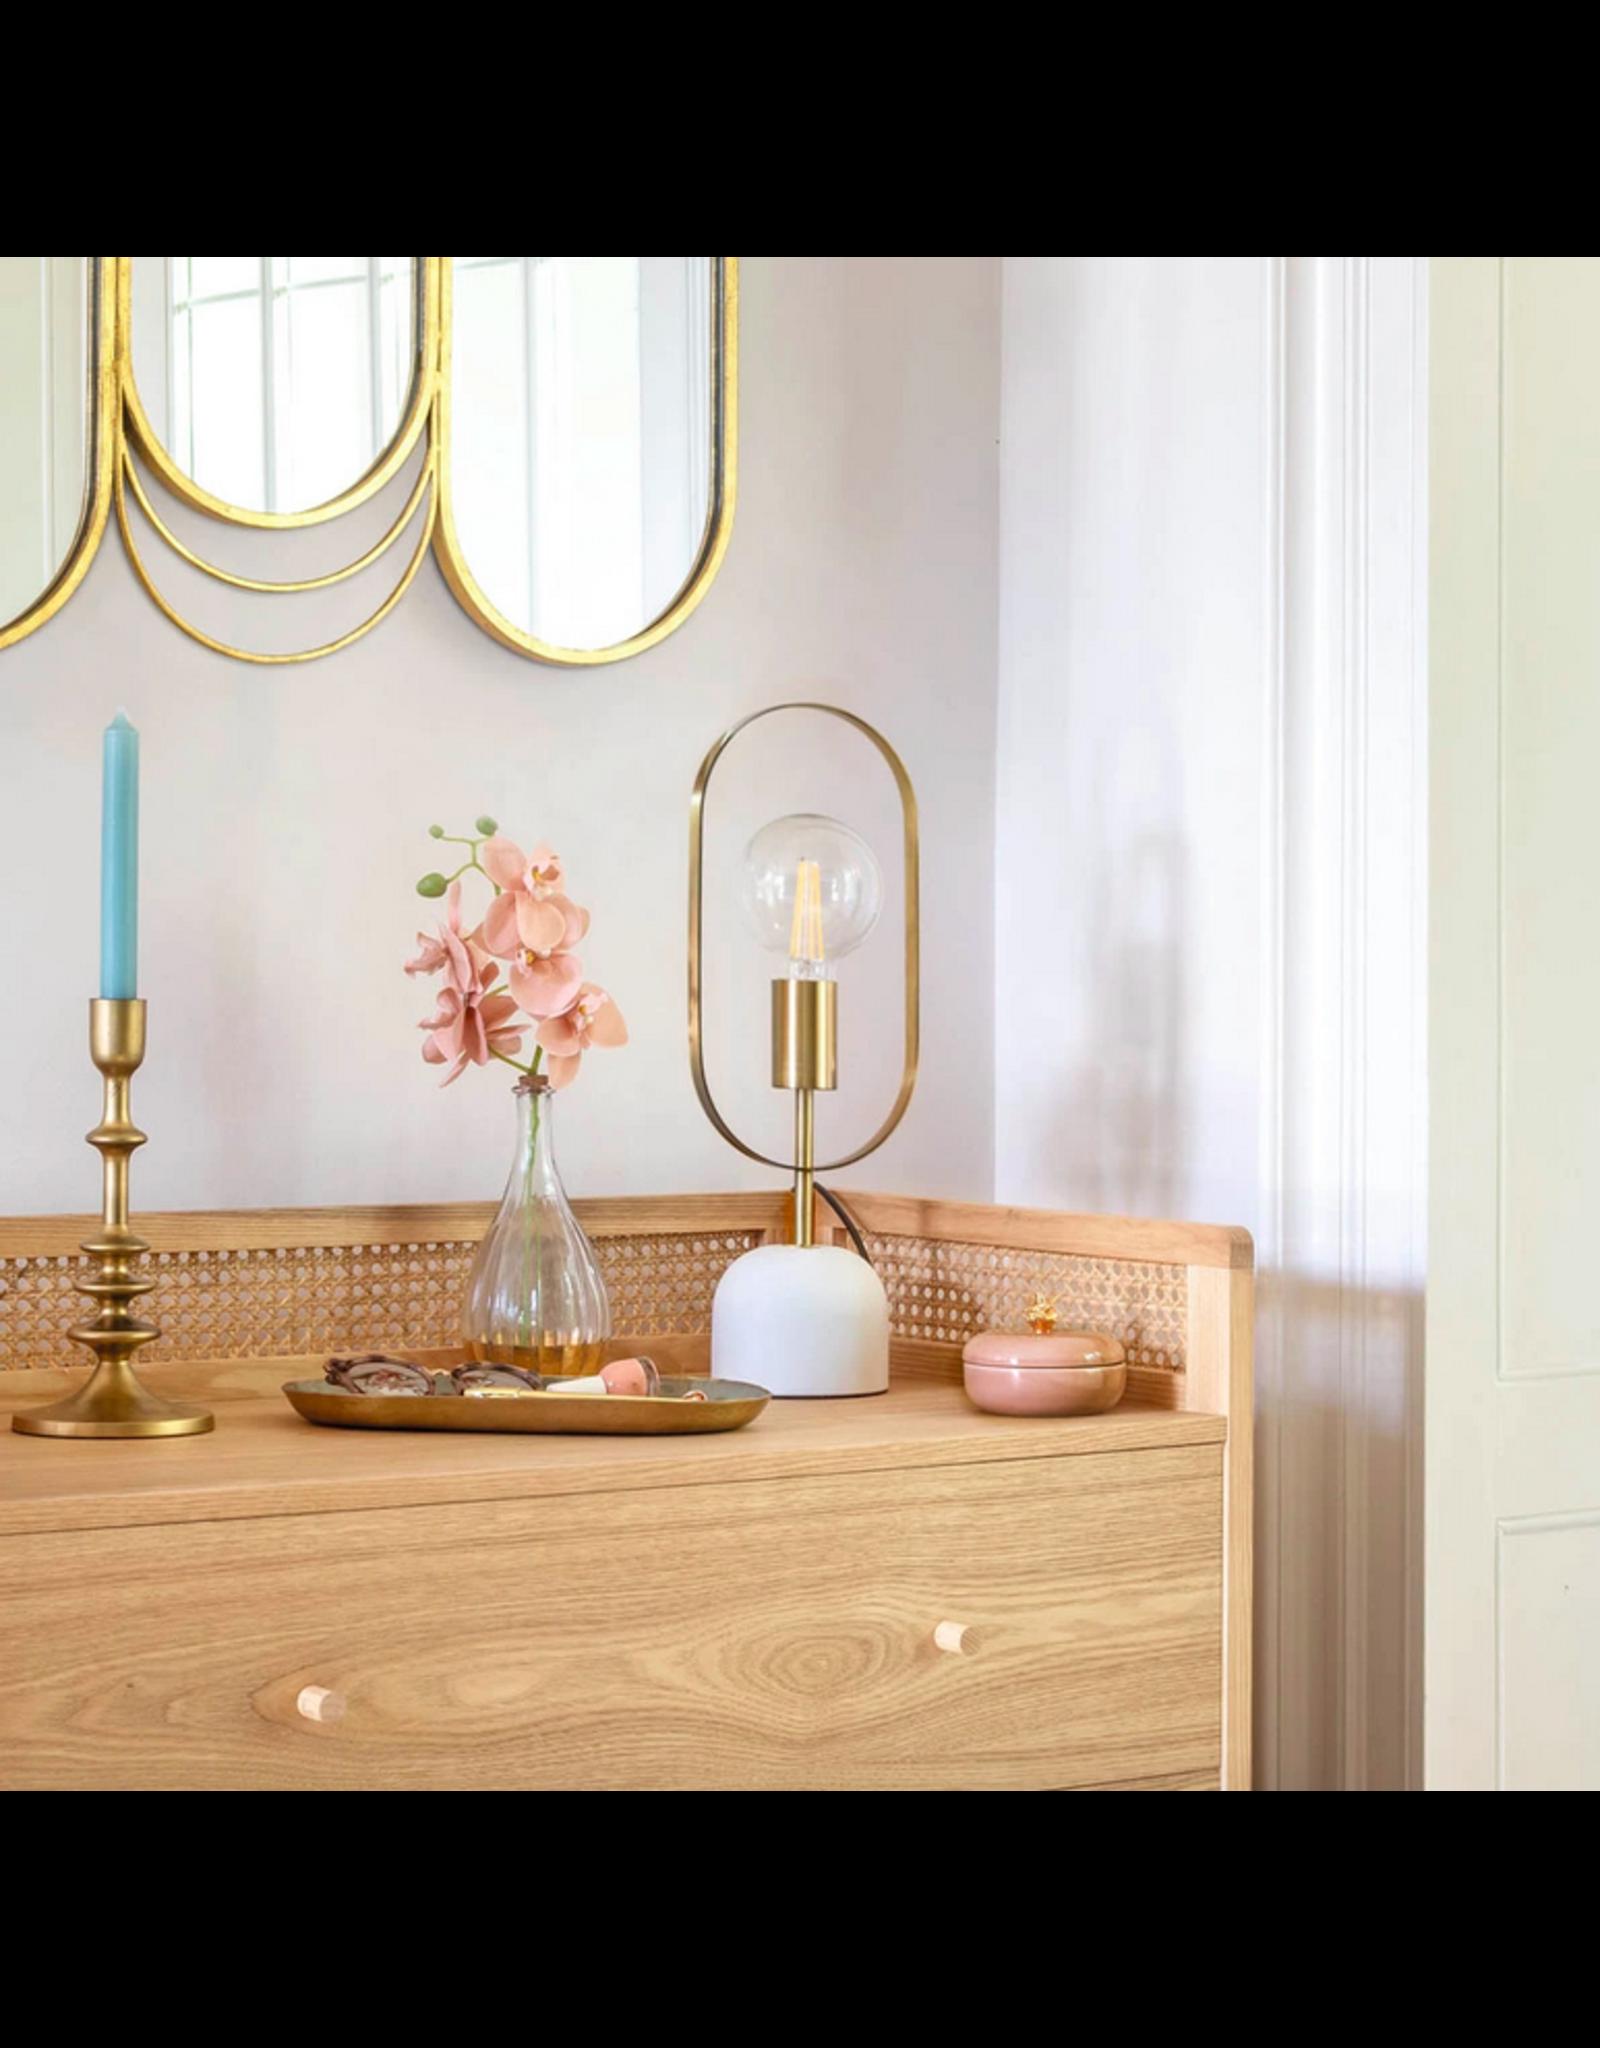 LOFT030 Tafellamp goudkleurig met grijze blauwe voet hoogte 44 cm